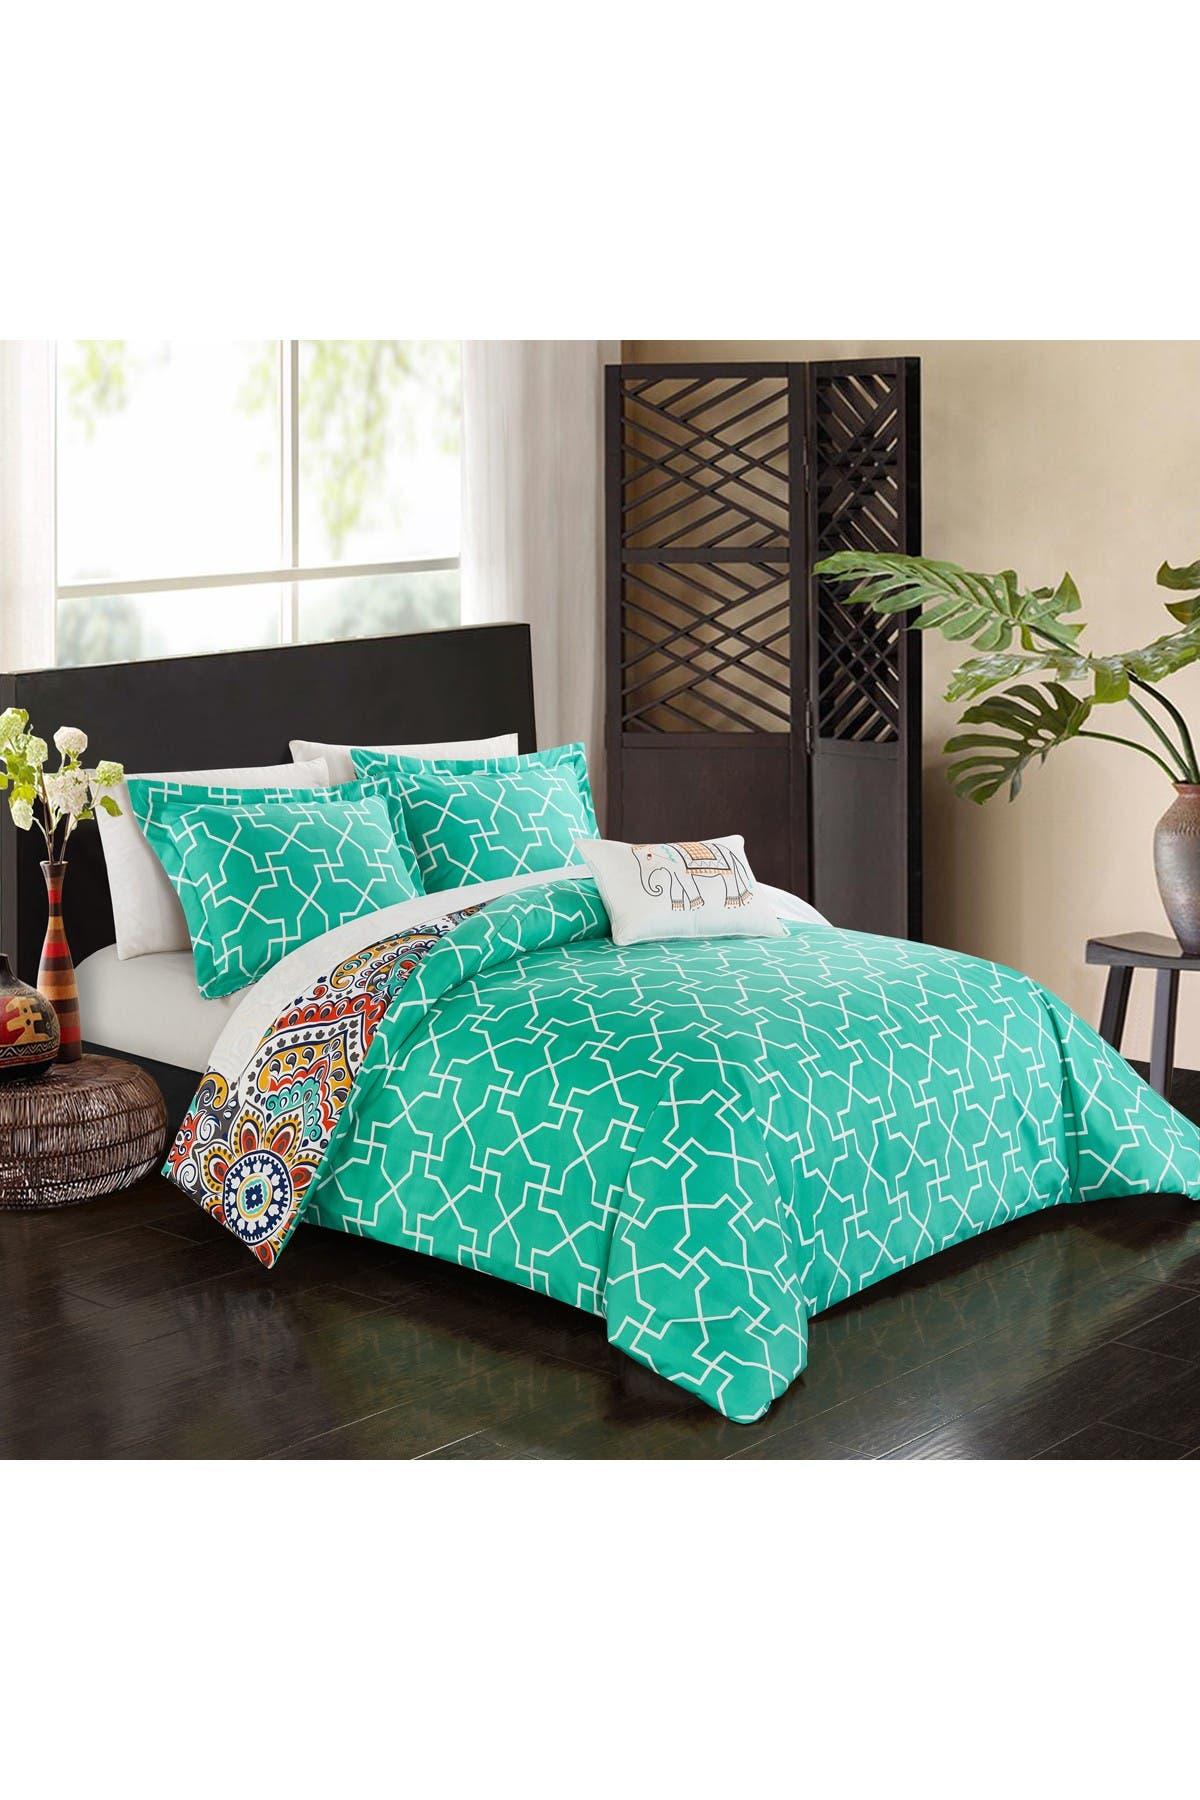 Chic Home Bedding Queen Max Reversible Boho Bed In A Bag Comforter Set Aqua Nordstrom Rack